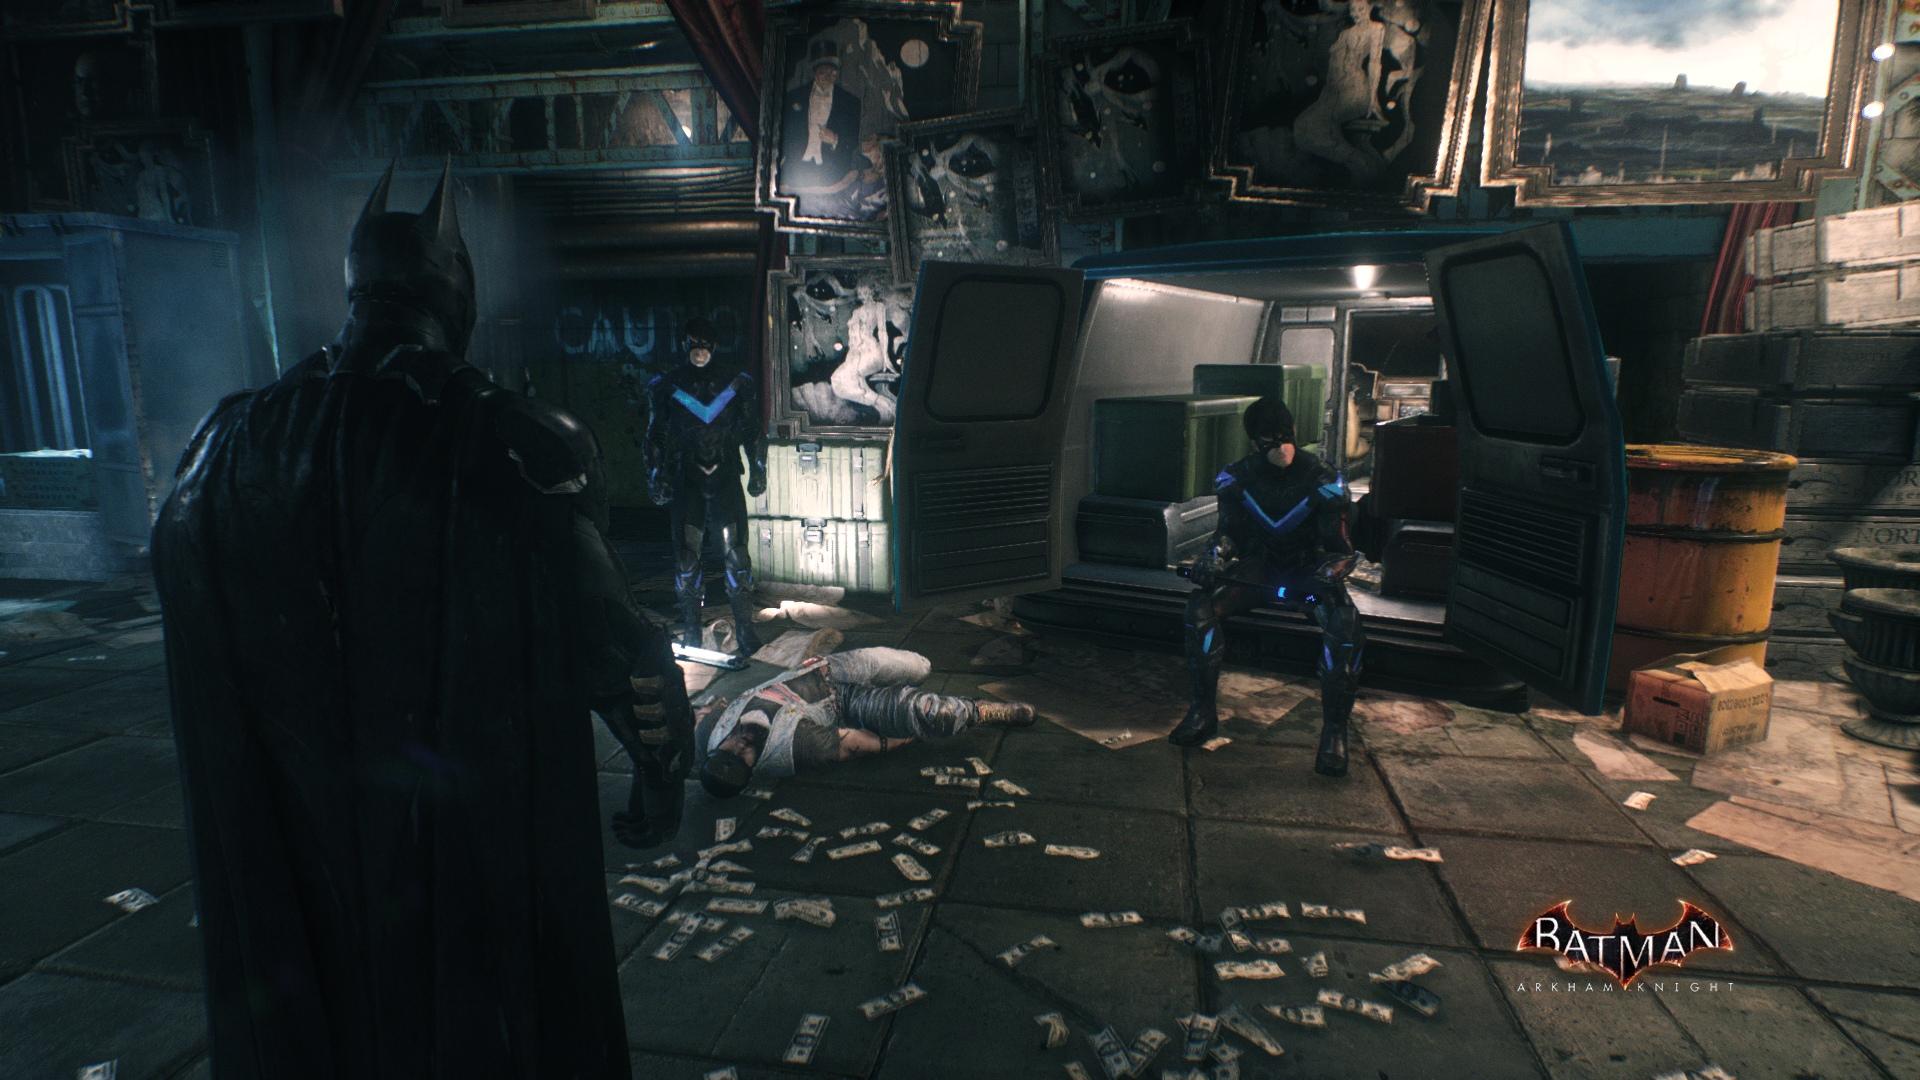 7GR5FbCtF5A.jpg - Batman: Arkham Knight